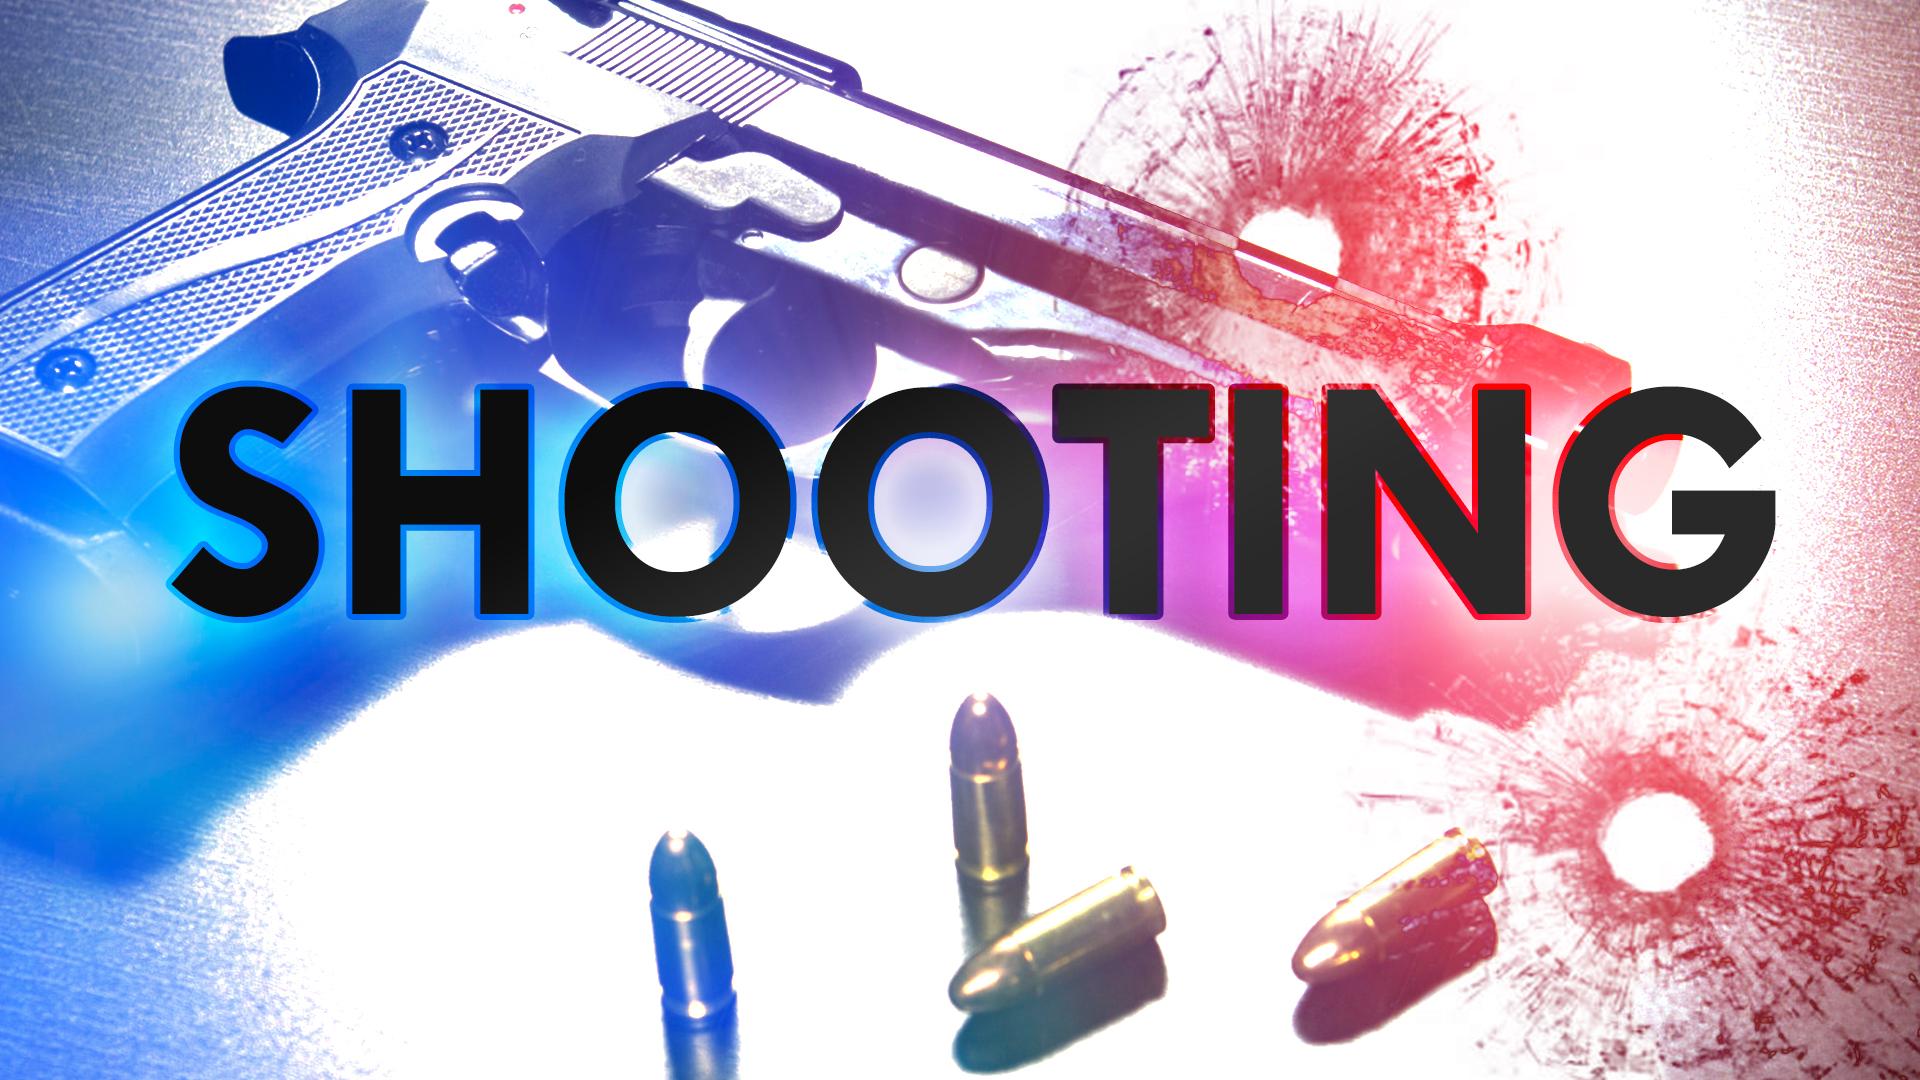 graphic FS Shooting_1523153169441.jpg.jpg